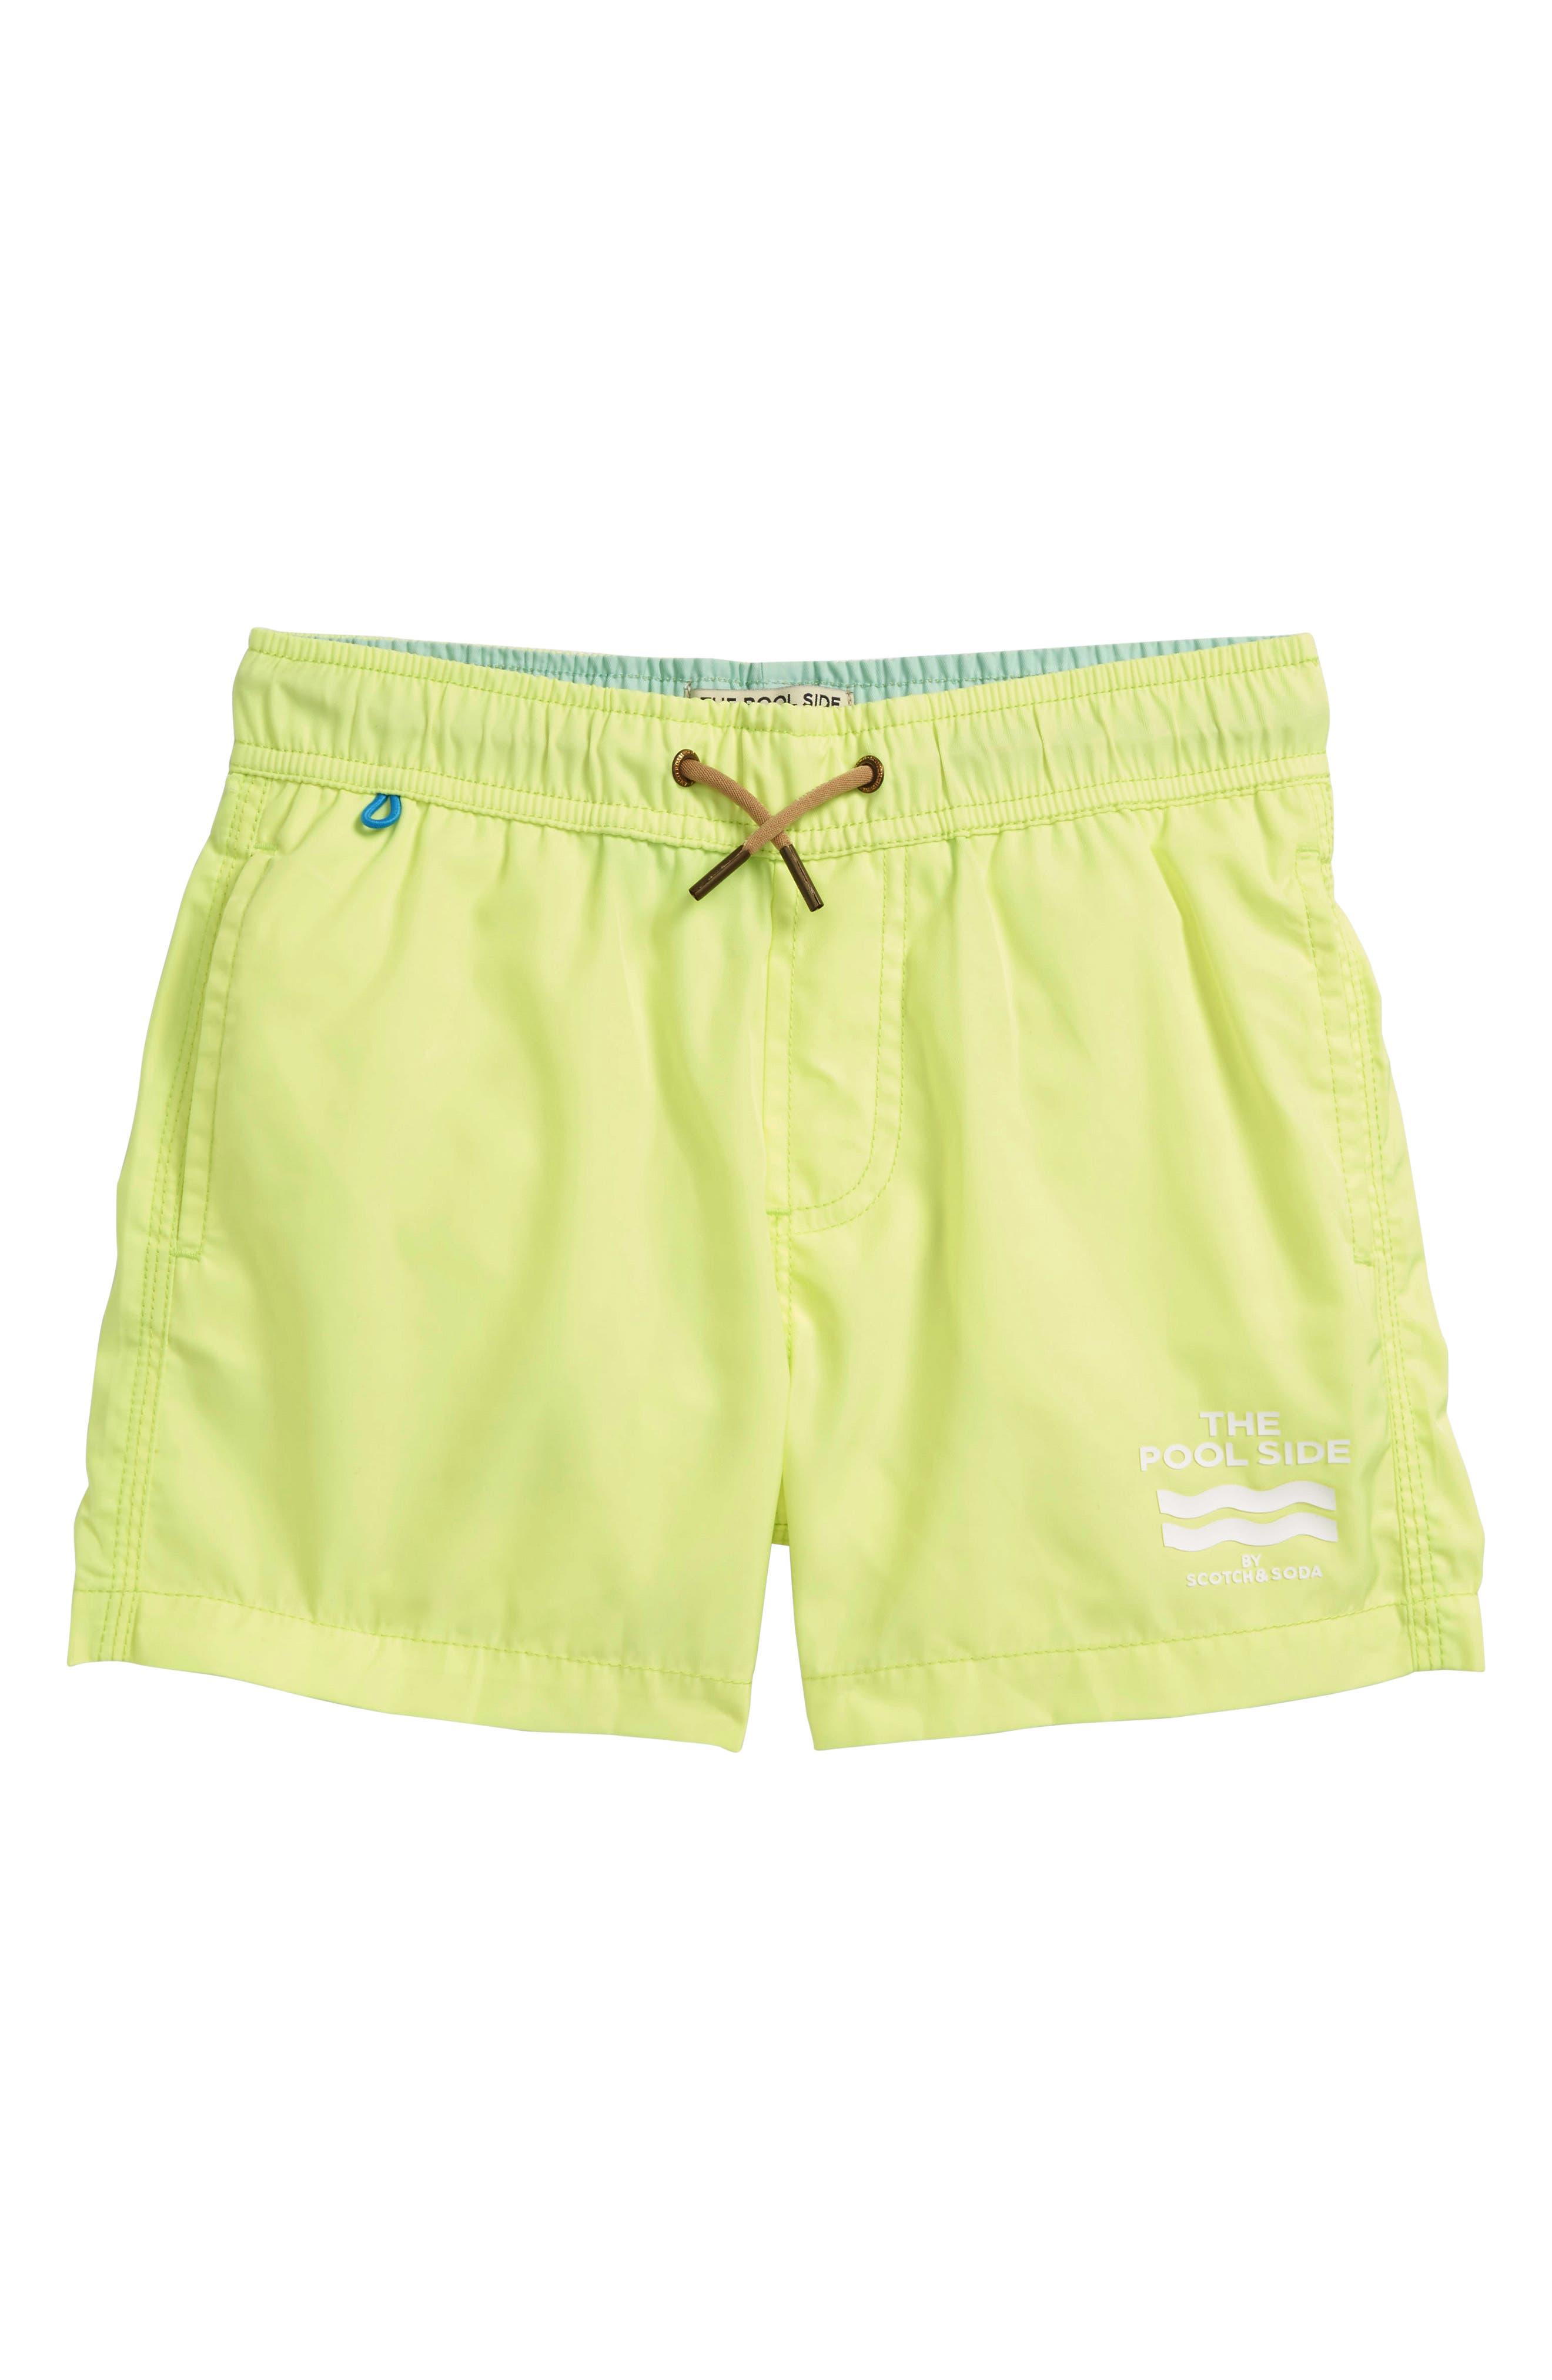 Swim Trunks,                         Main,                         color, Citrine